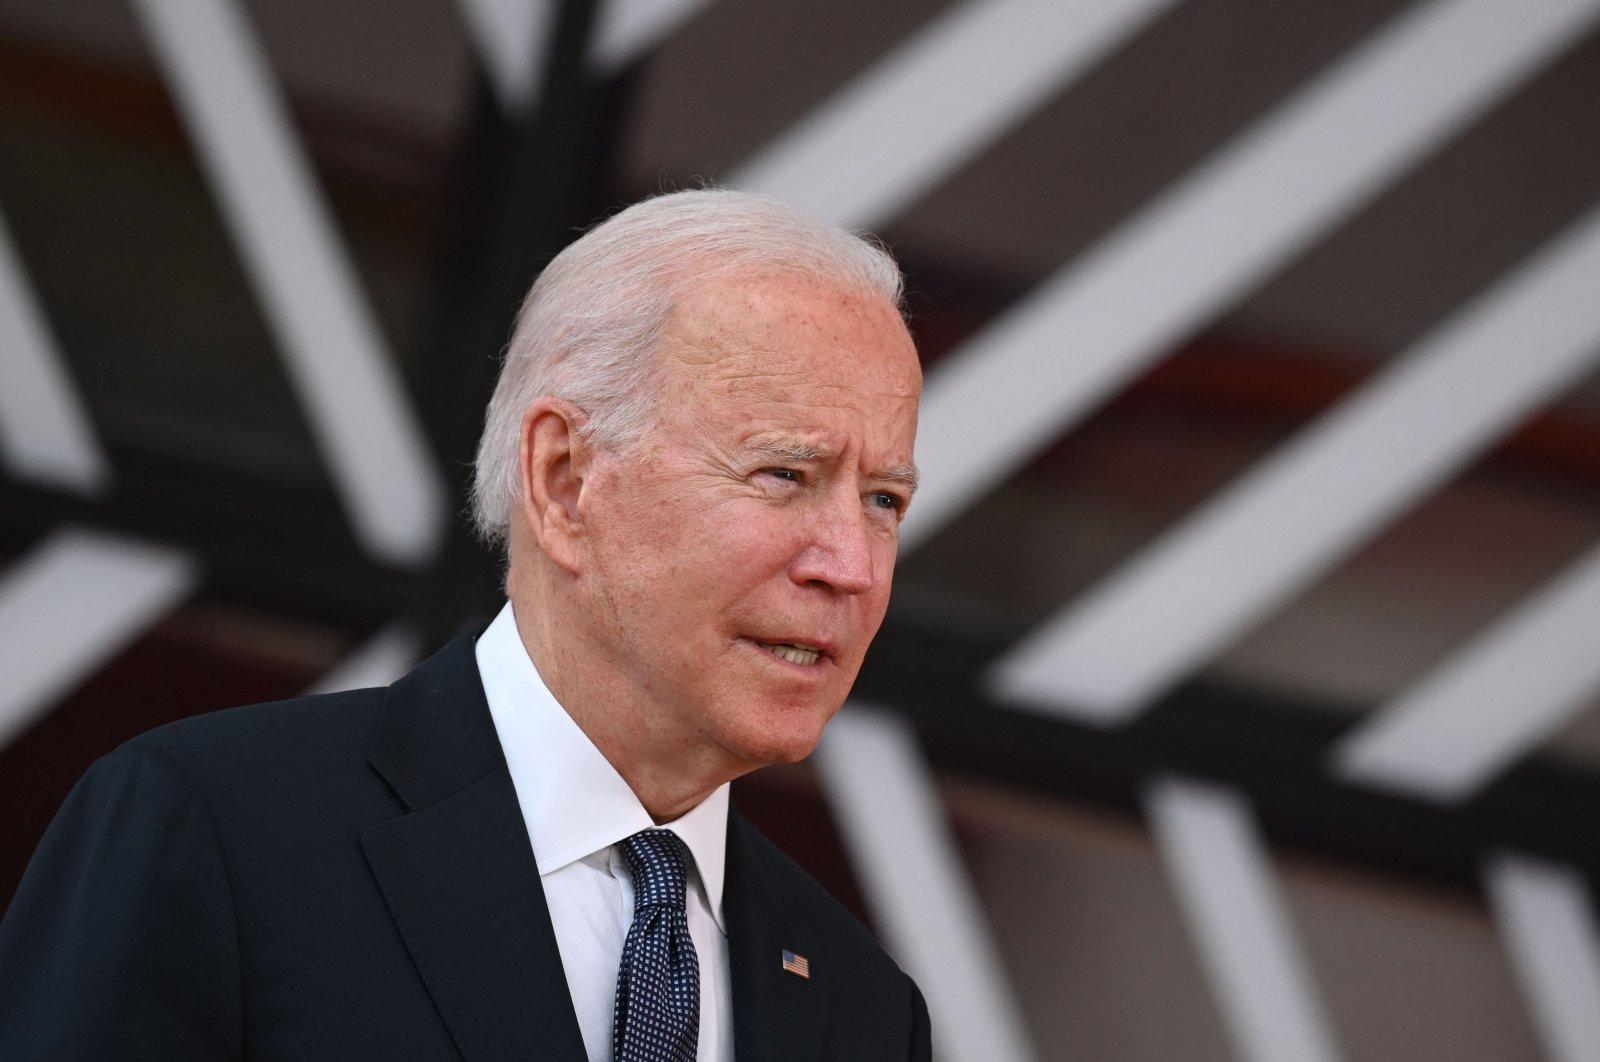 U.S. President Joe Biden arrives for an EU-U.S. summit at the European Union headquarters in Brussels, Belgium, on June 15, 2021. (AFP Photo)